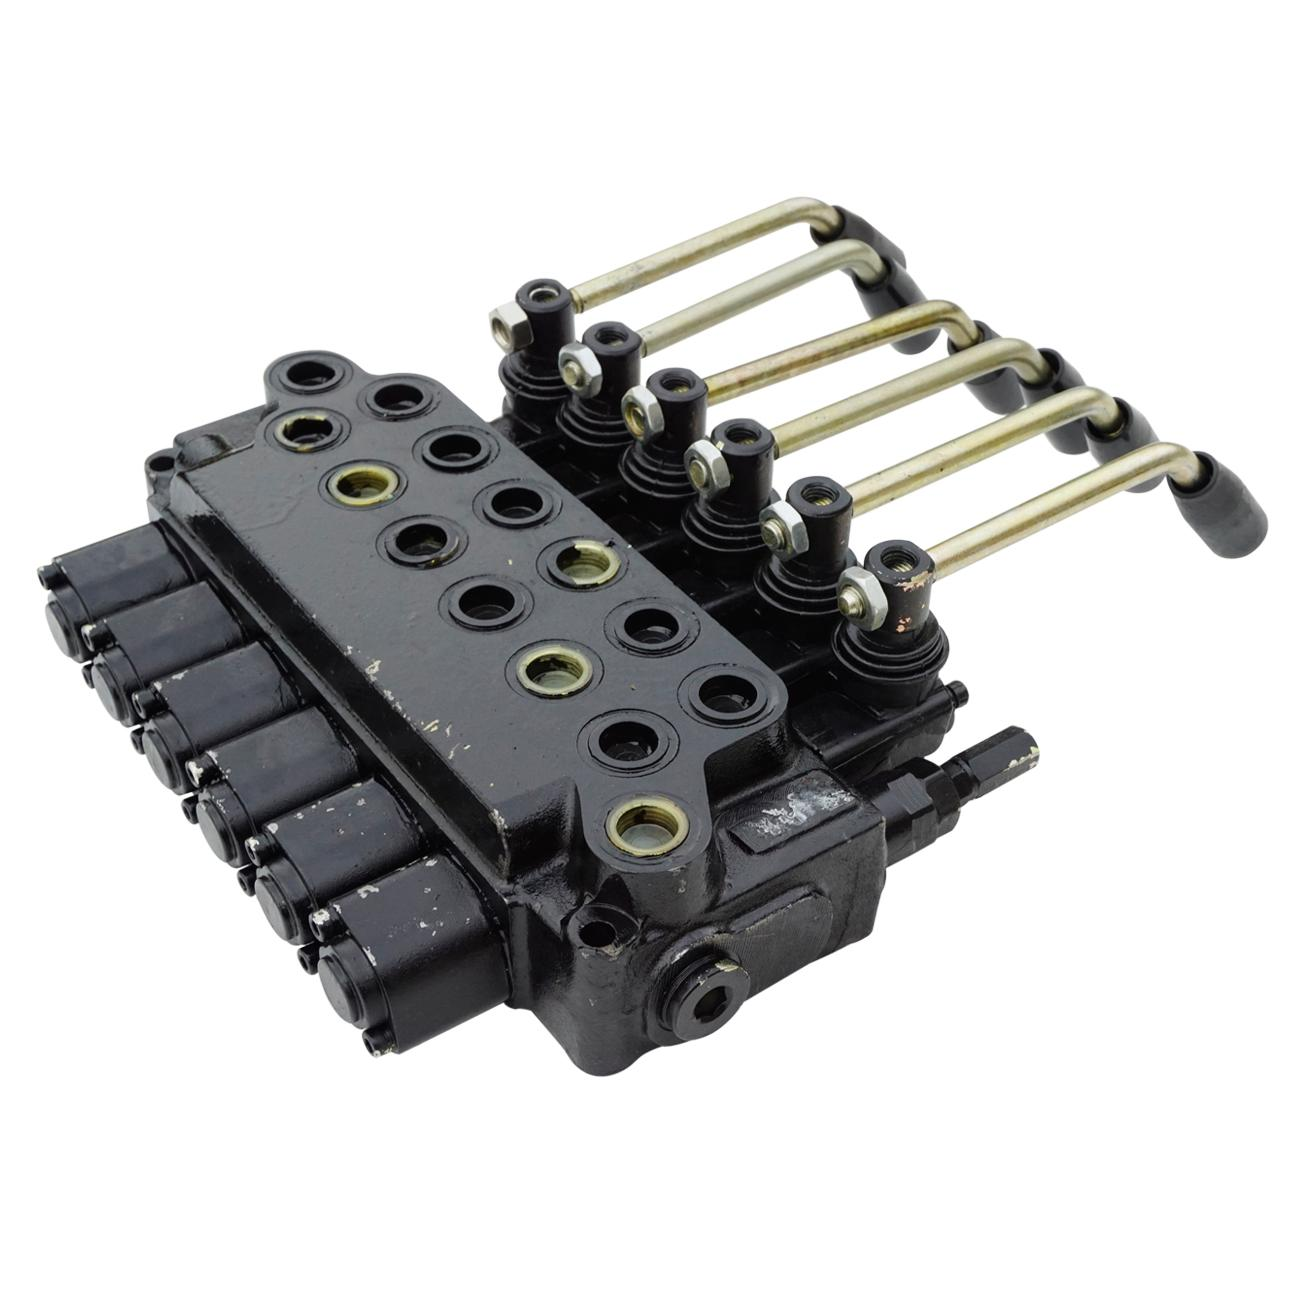 ECO шесть катушка гидравлический клапан 6 катушка моноблочный клапан 10GPM 4500PSI Макс.